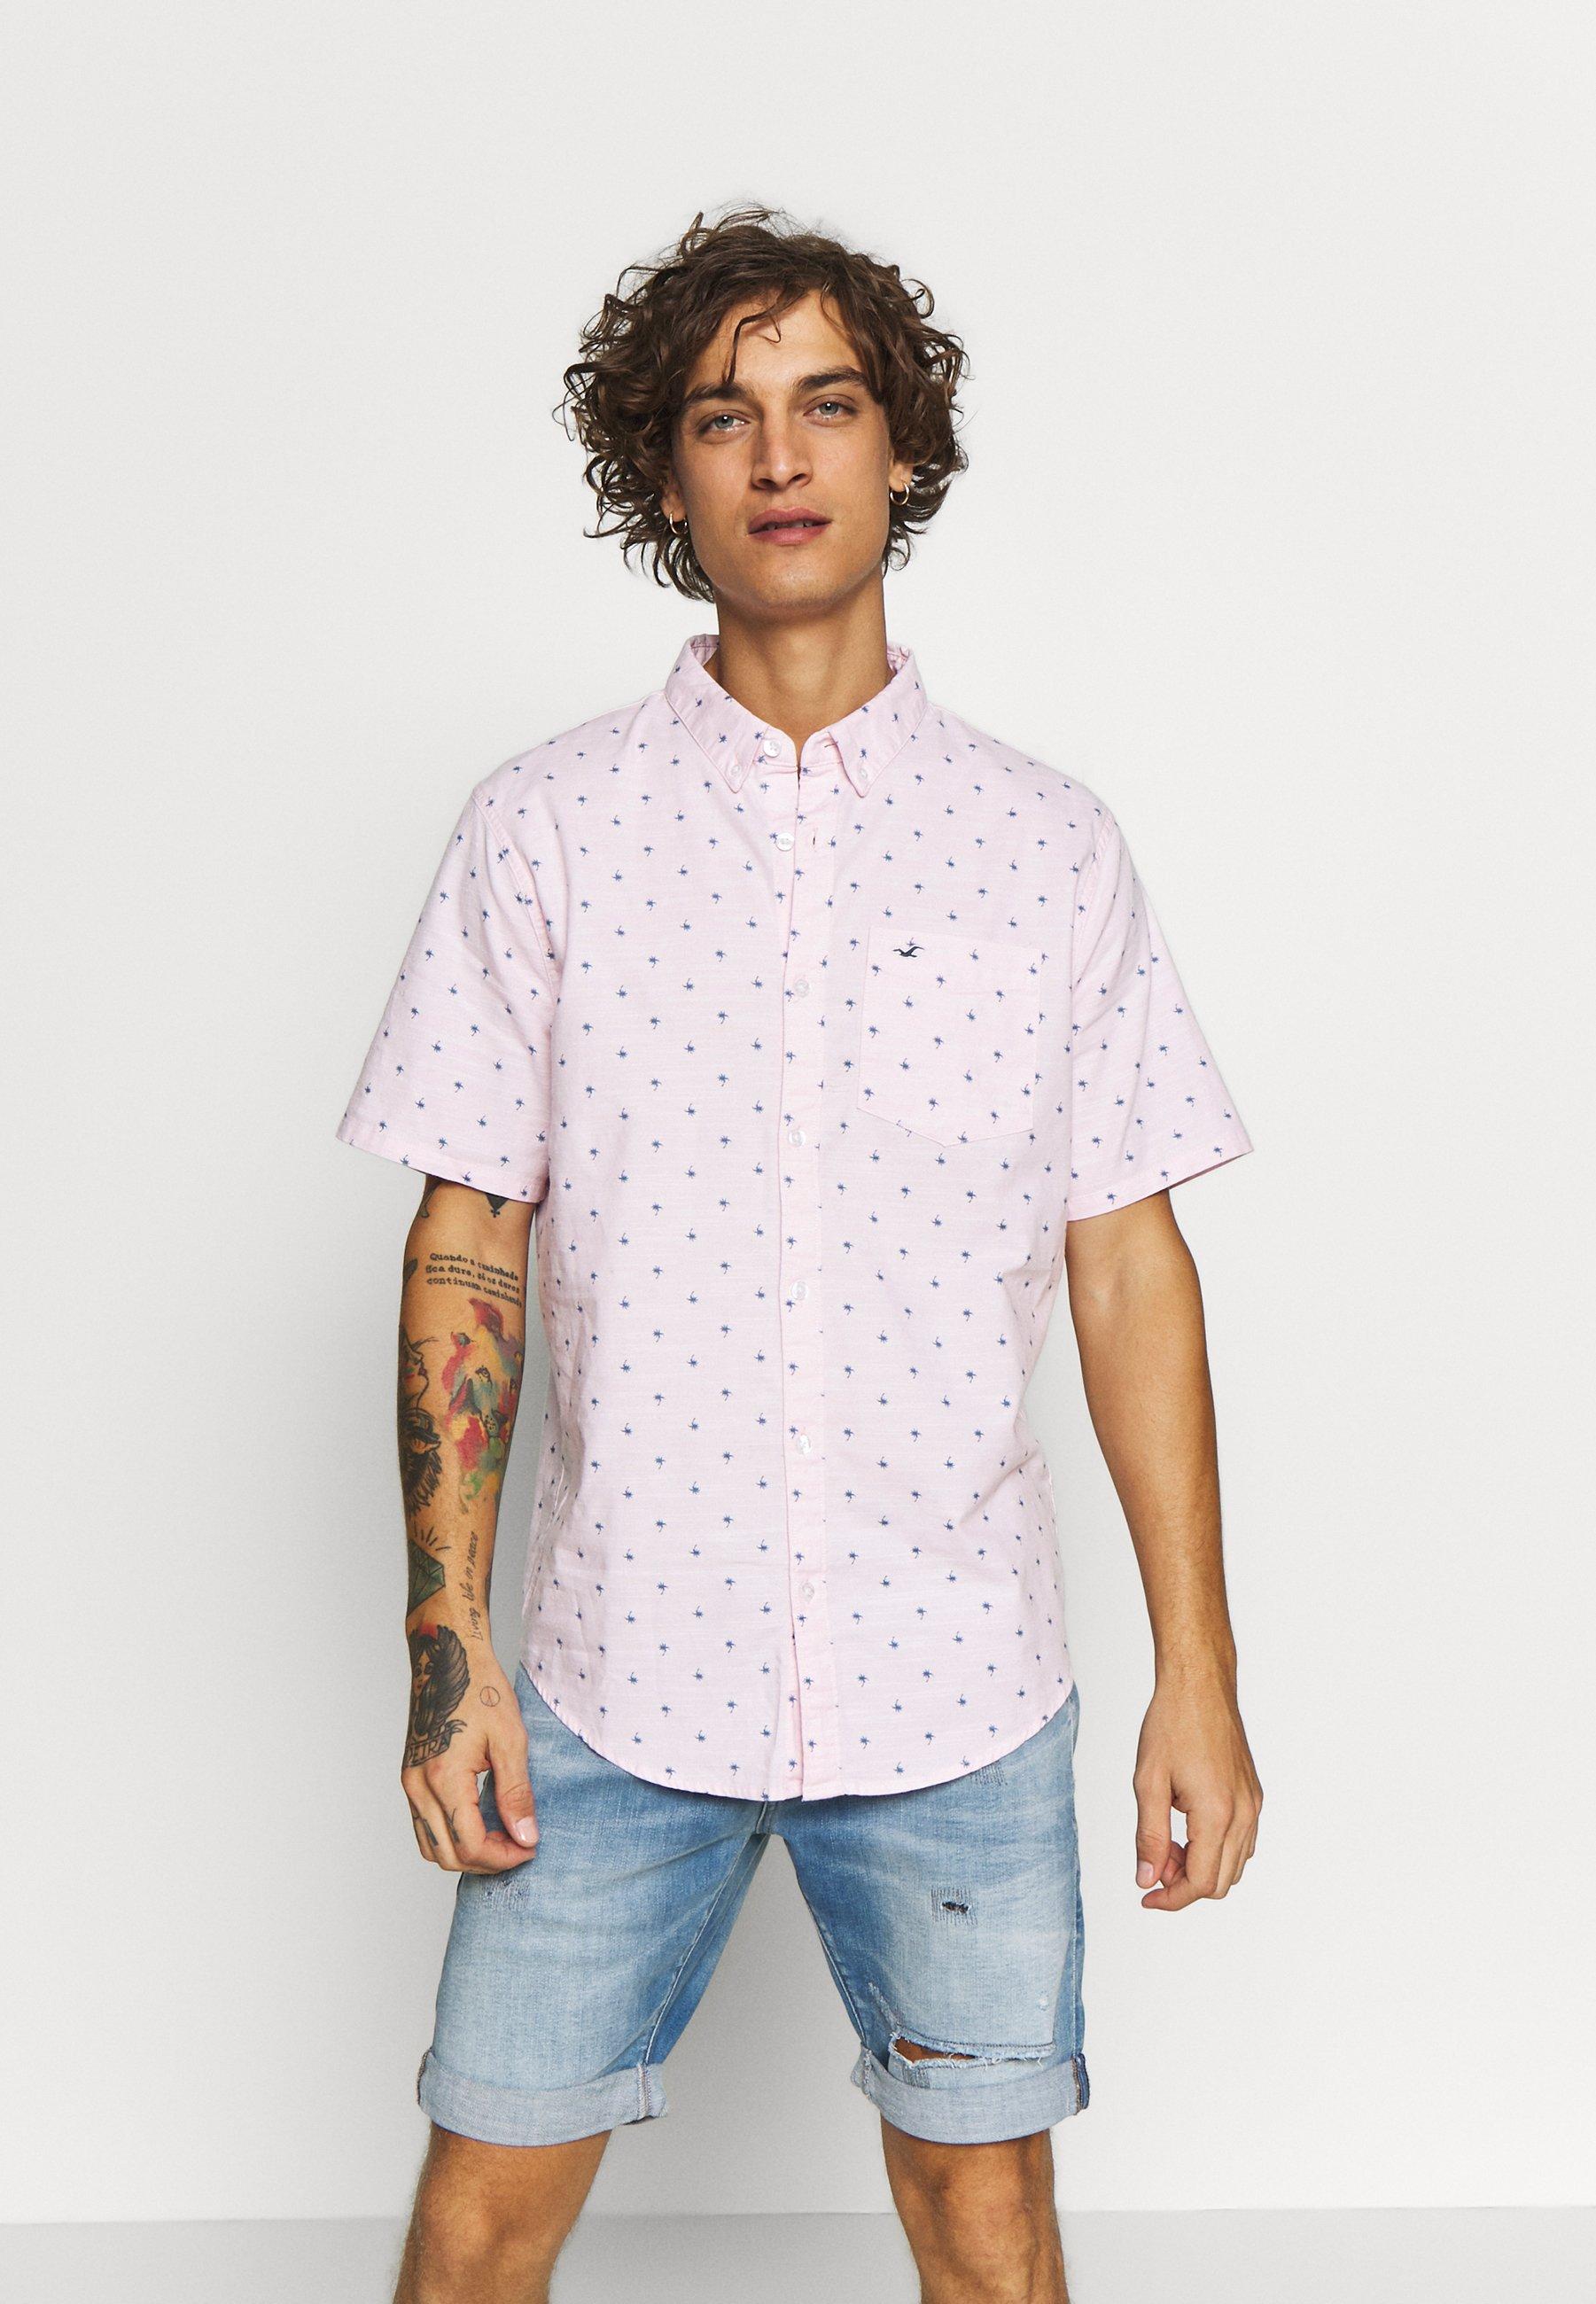 Hollister Co. SLIM FIT - Hemd - pink geo | Herrenbekleidung 2020